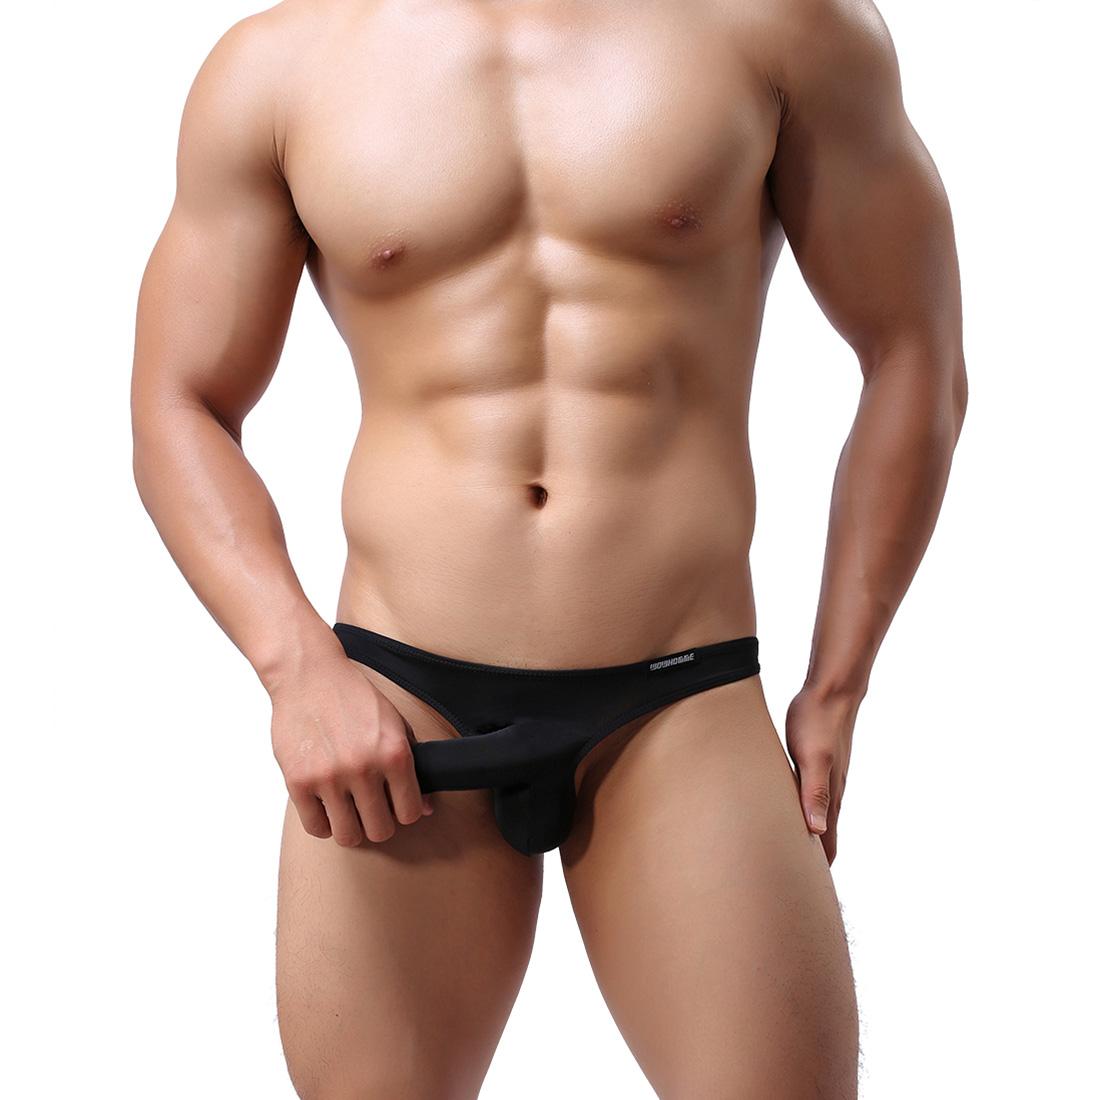 Men's Lingerie Underwear Sexy Bikini Triangle Pants ...